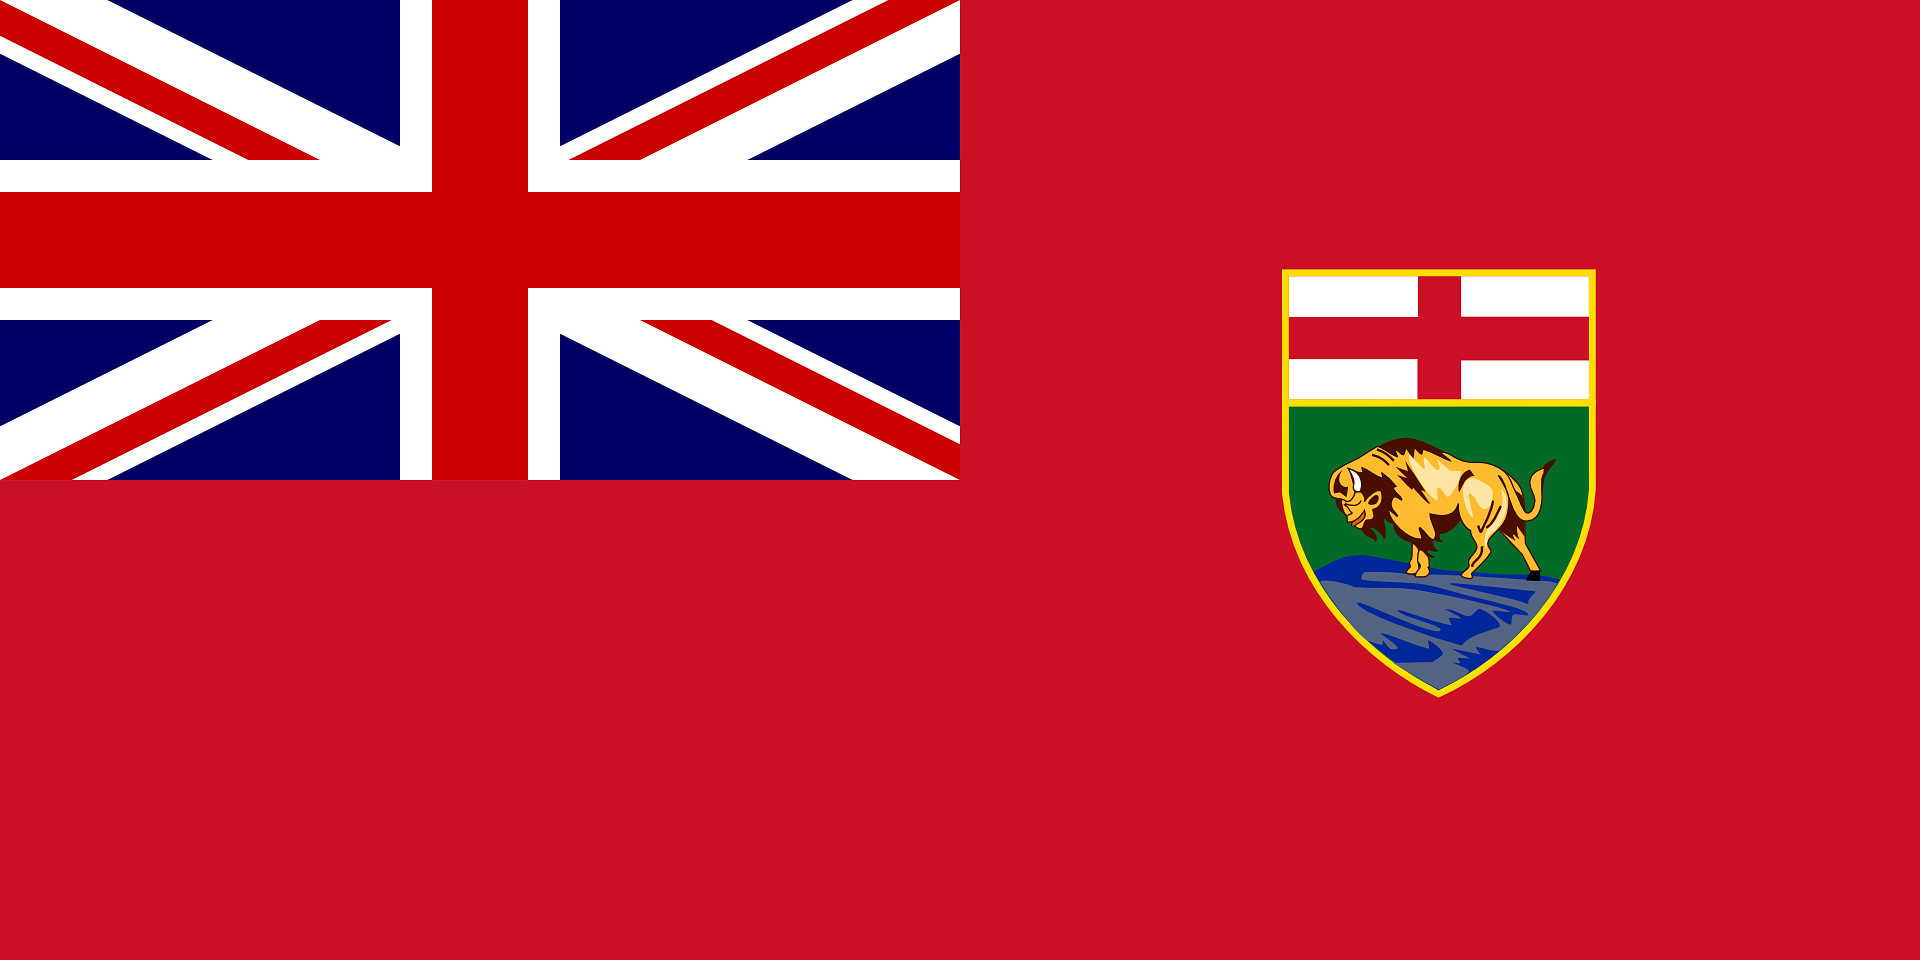 Manitoba Provincial Program